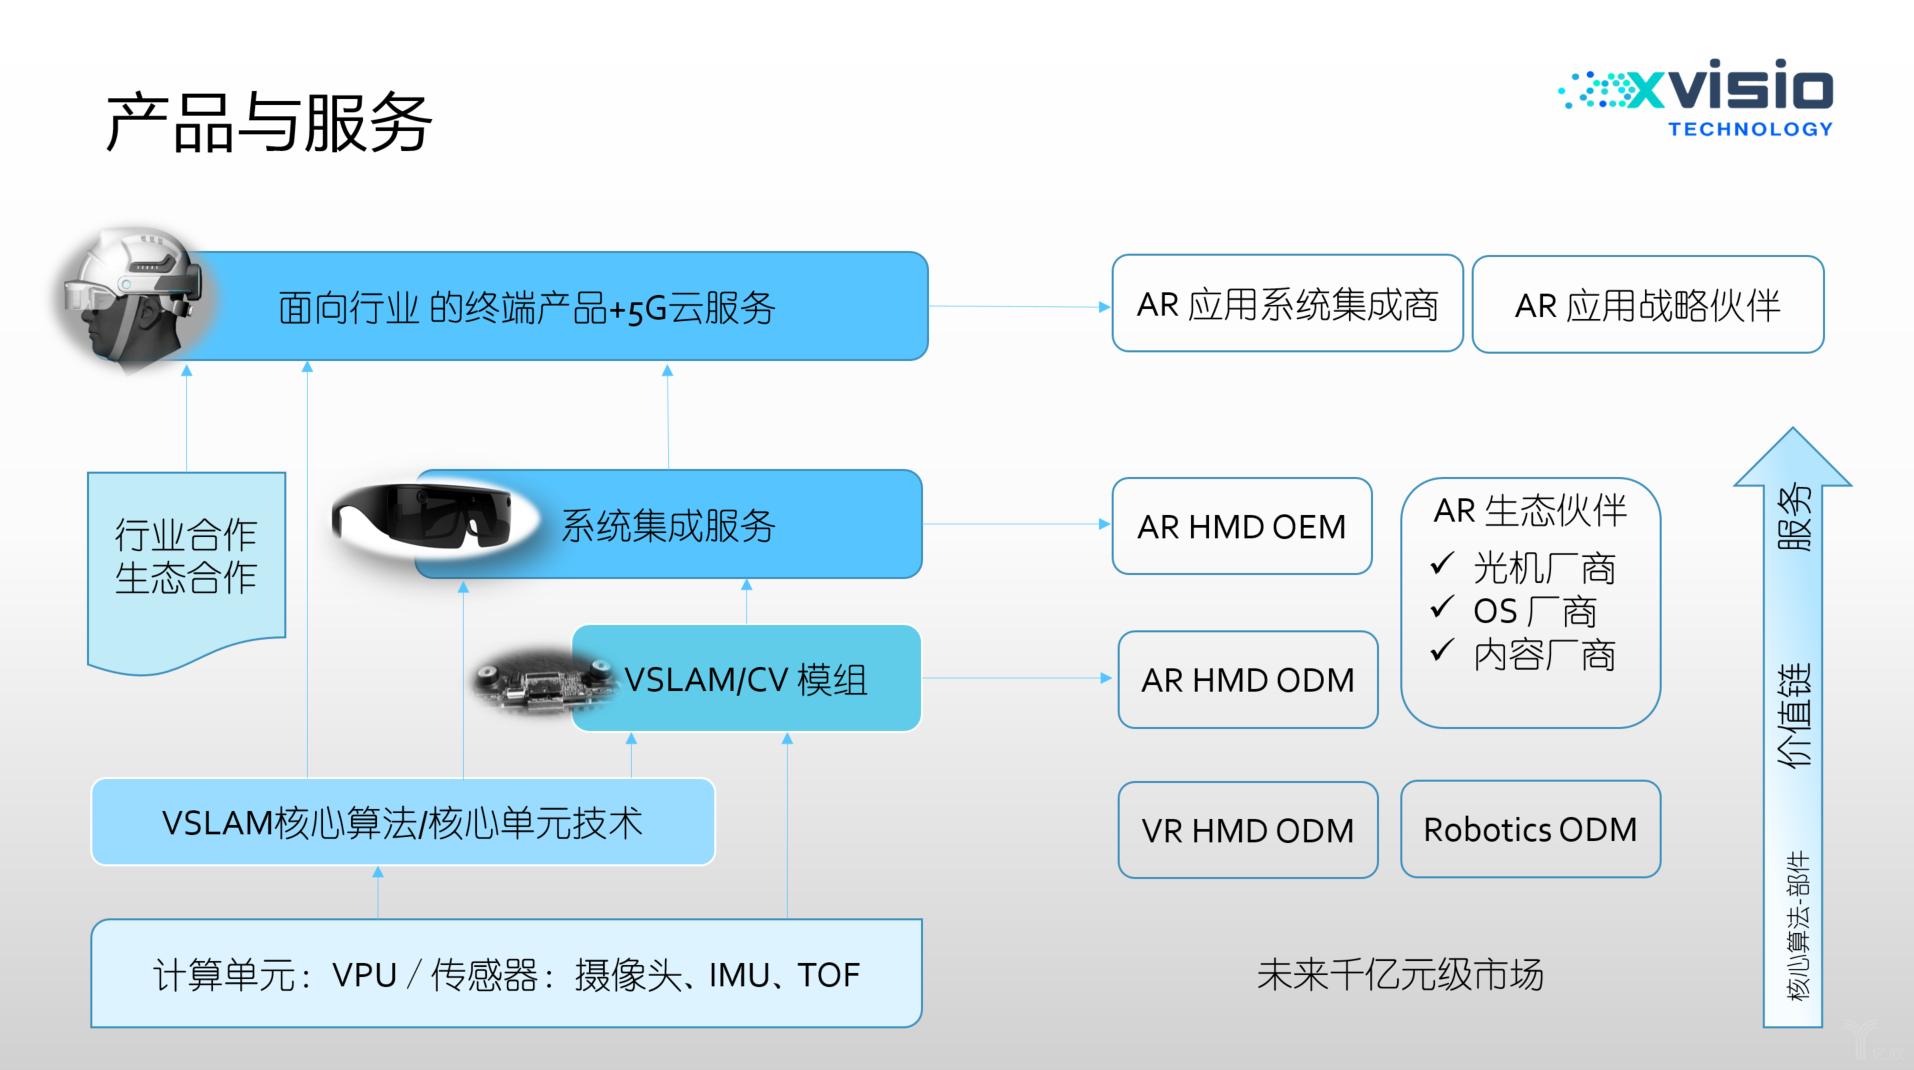 VSLAM+AI开发商诠视科技获千万级Pre-A轮融资